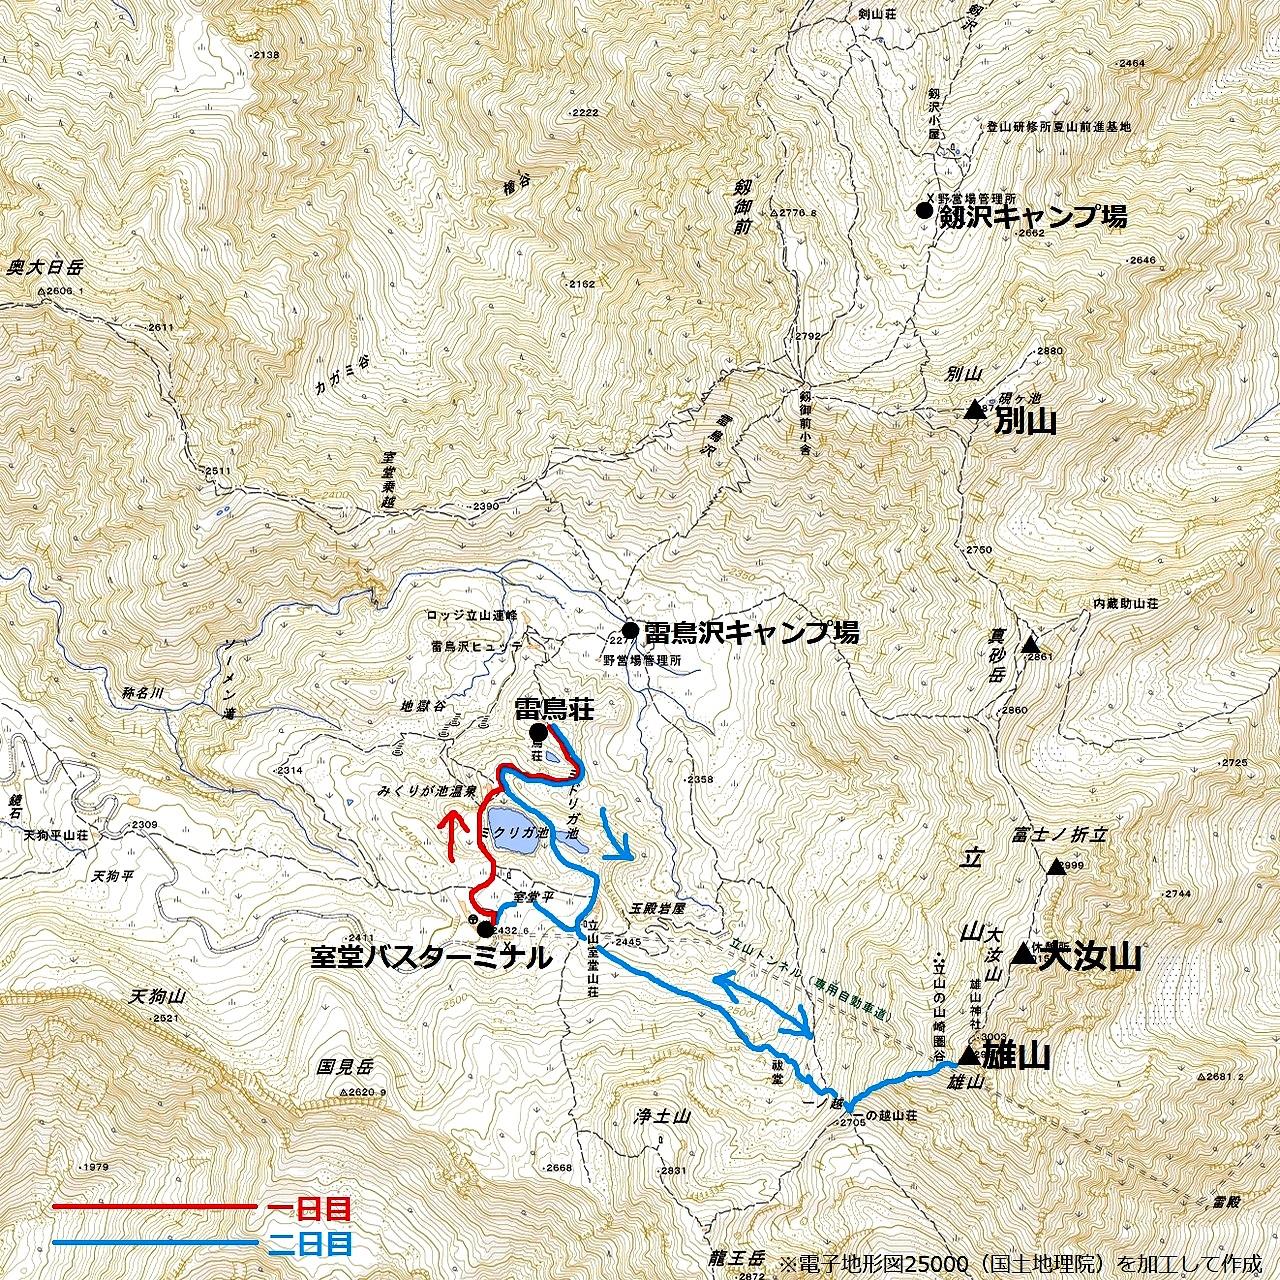 210504立山-map